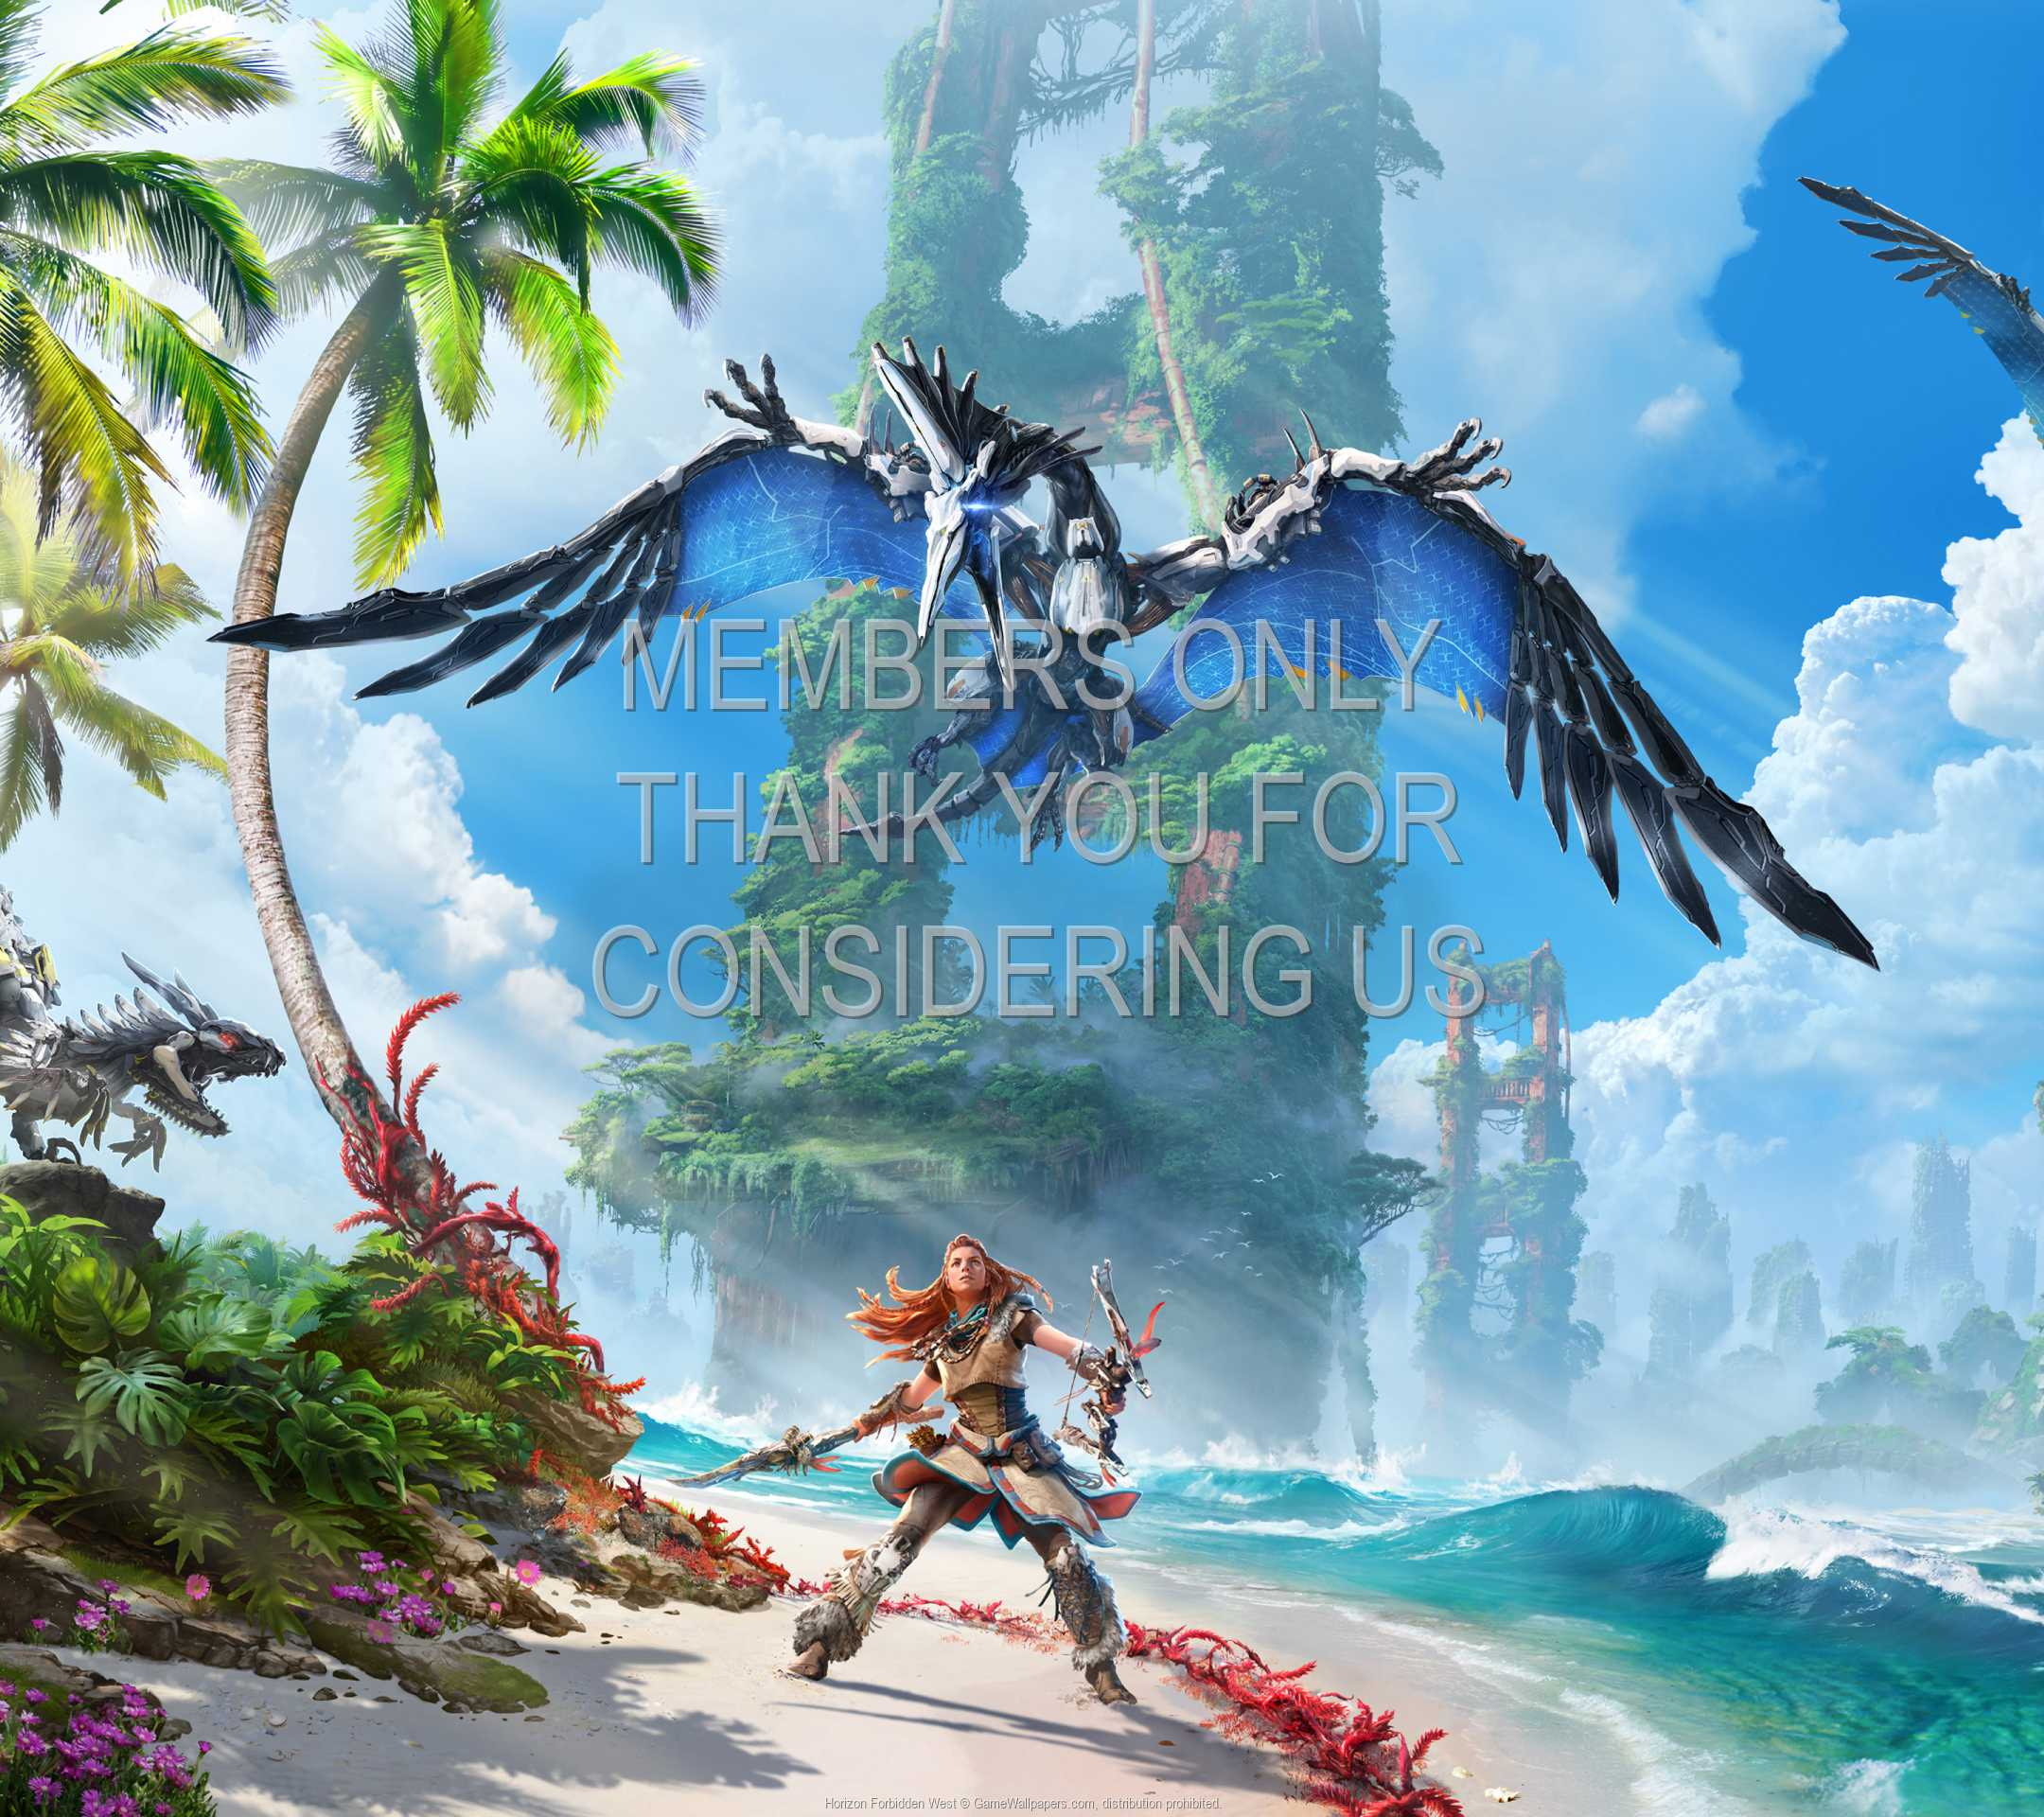 Horizon: Forbidden West 1080p Horizontal Mobiele achtergrond 01